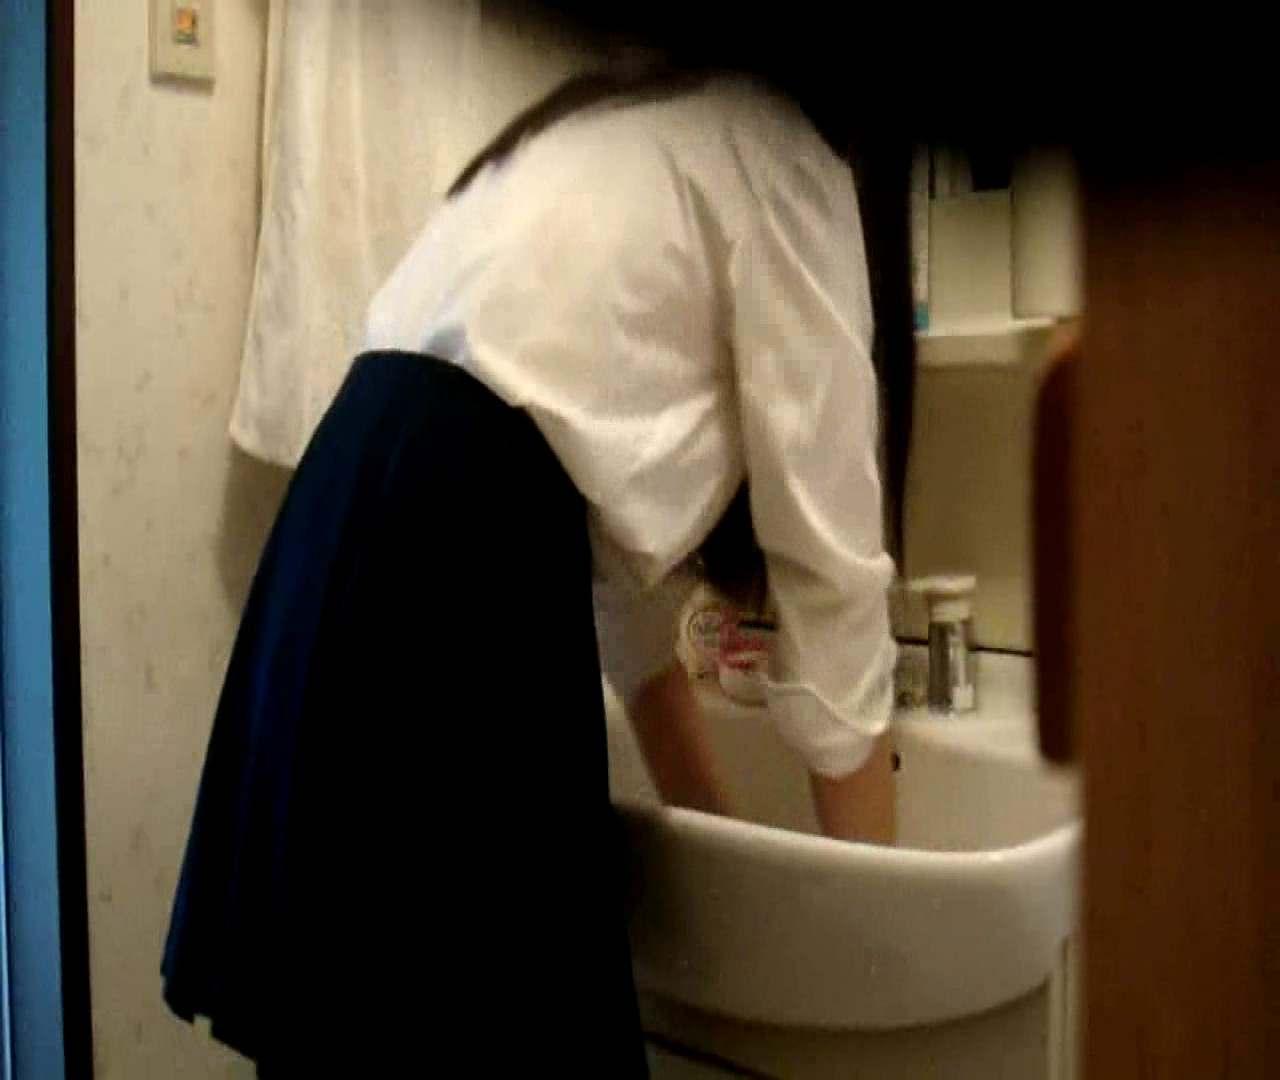 vol.5 まどかが帰宅後の洗顔後にブラを洗ってます。 ギャル達 | 民家  112枚 25